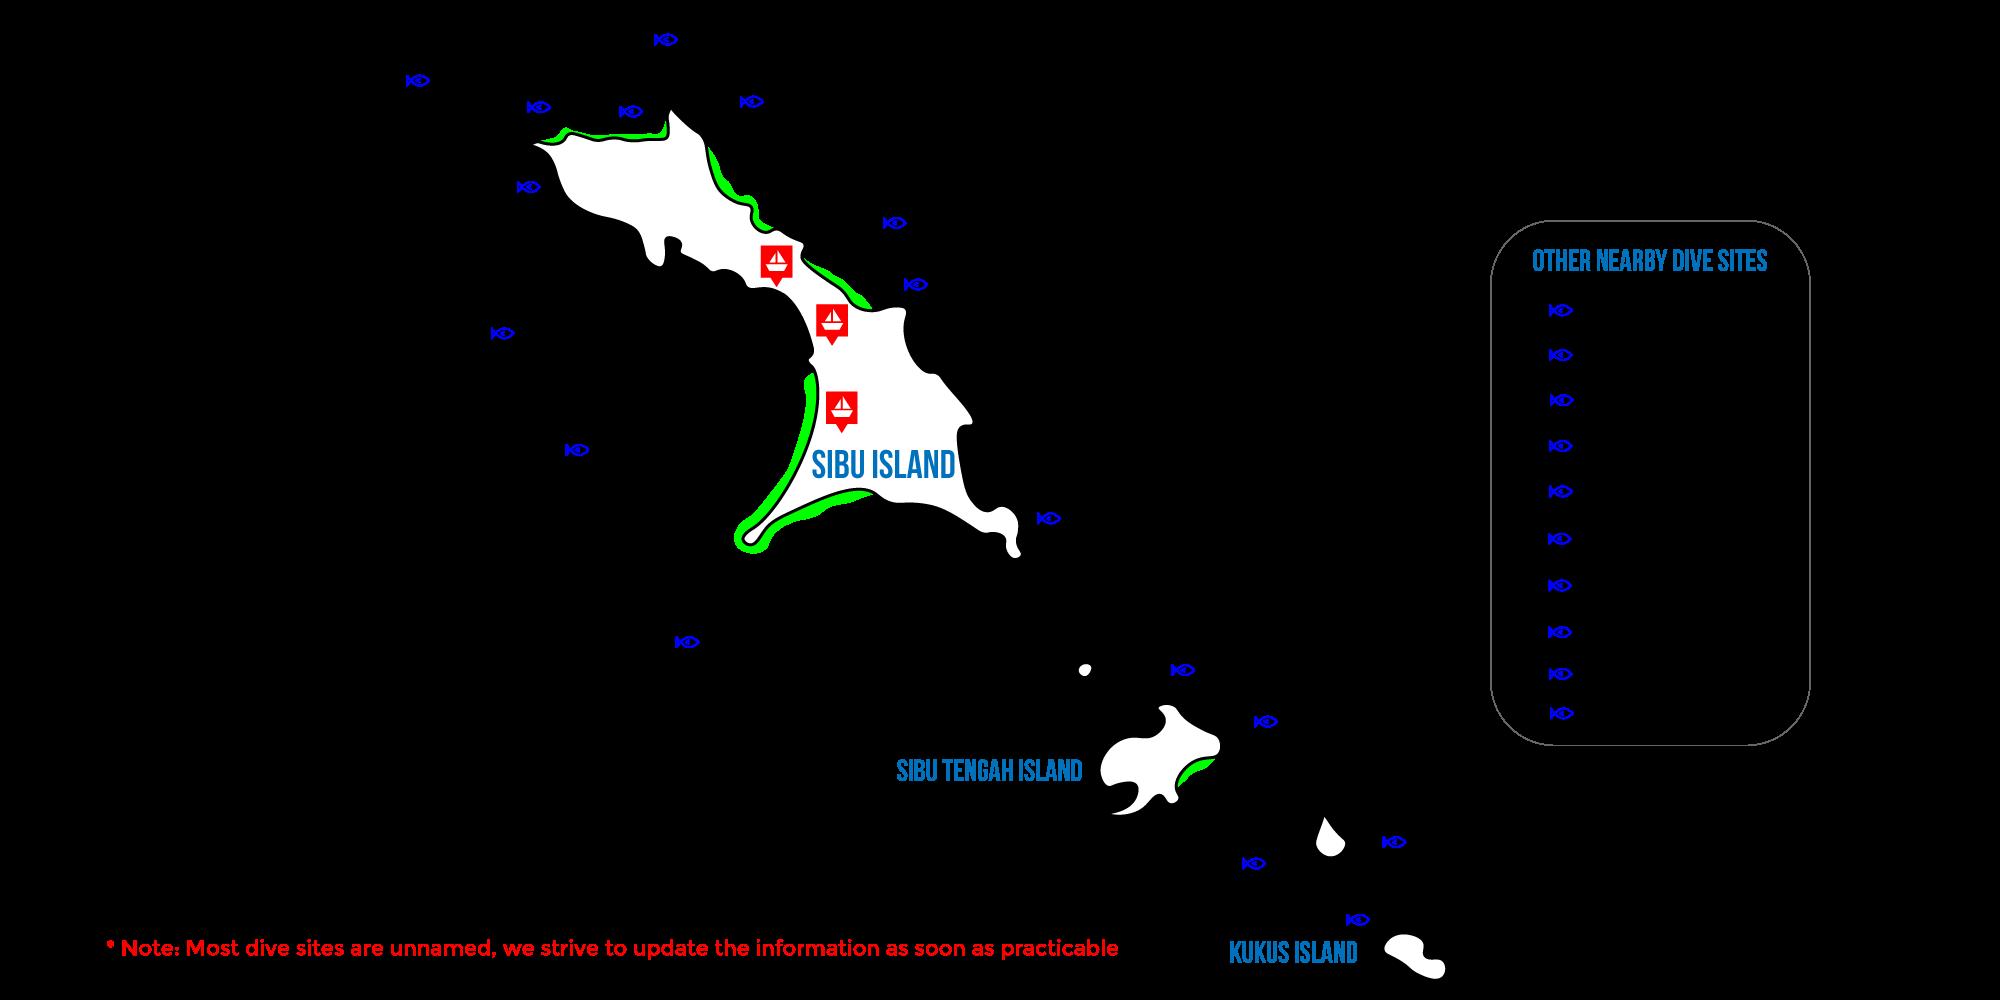 sibu island map